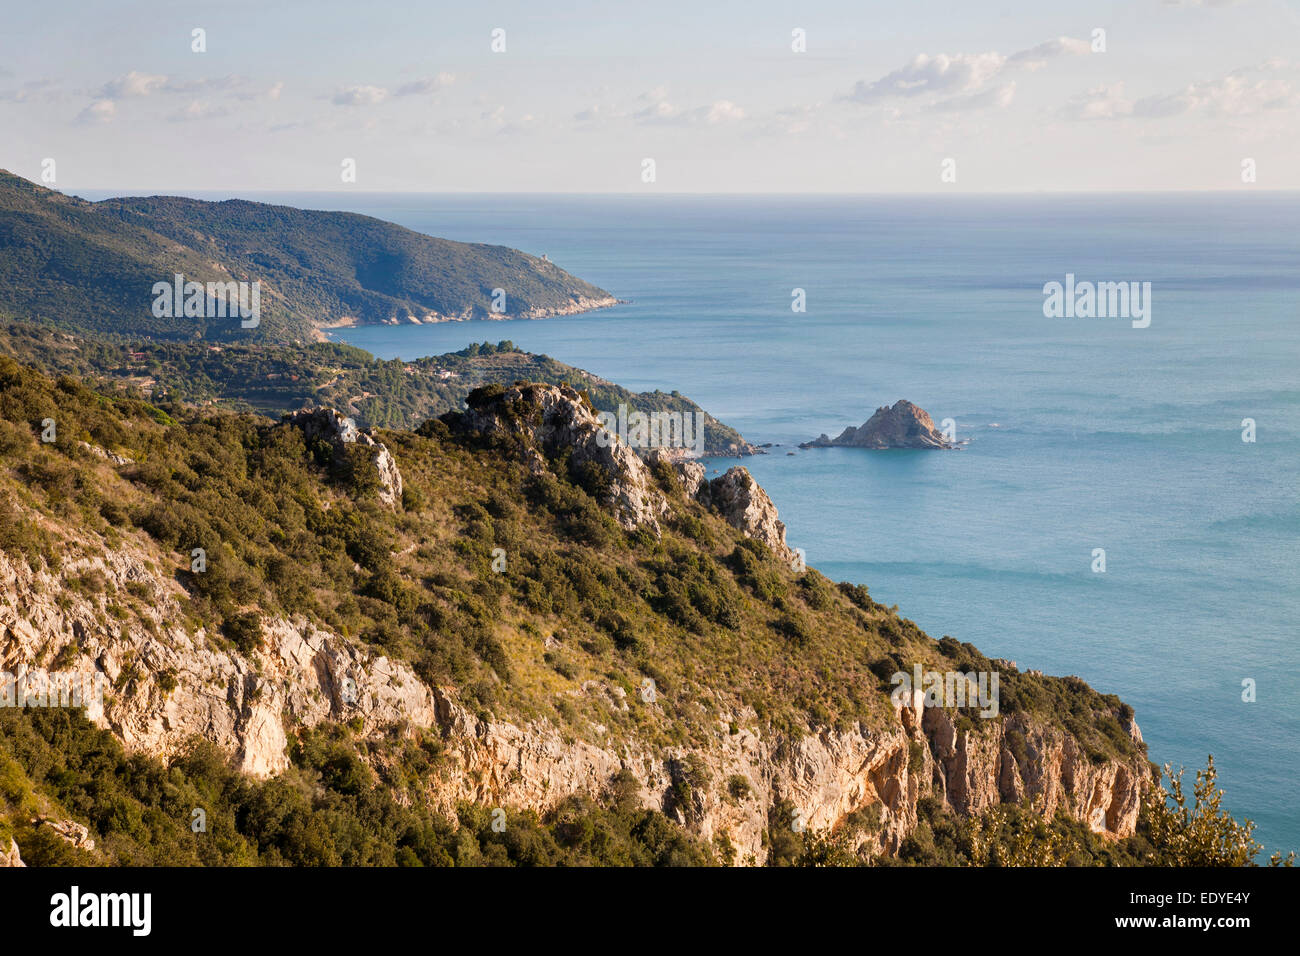 panorama, argentario, tuscany, italy, europe - Stock Image